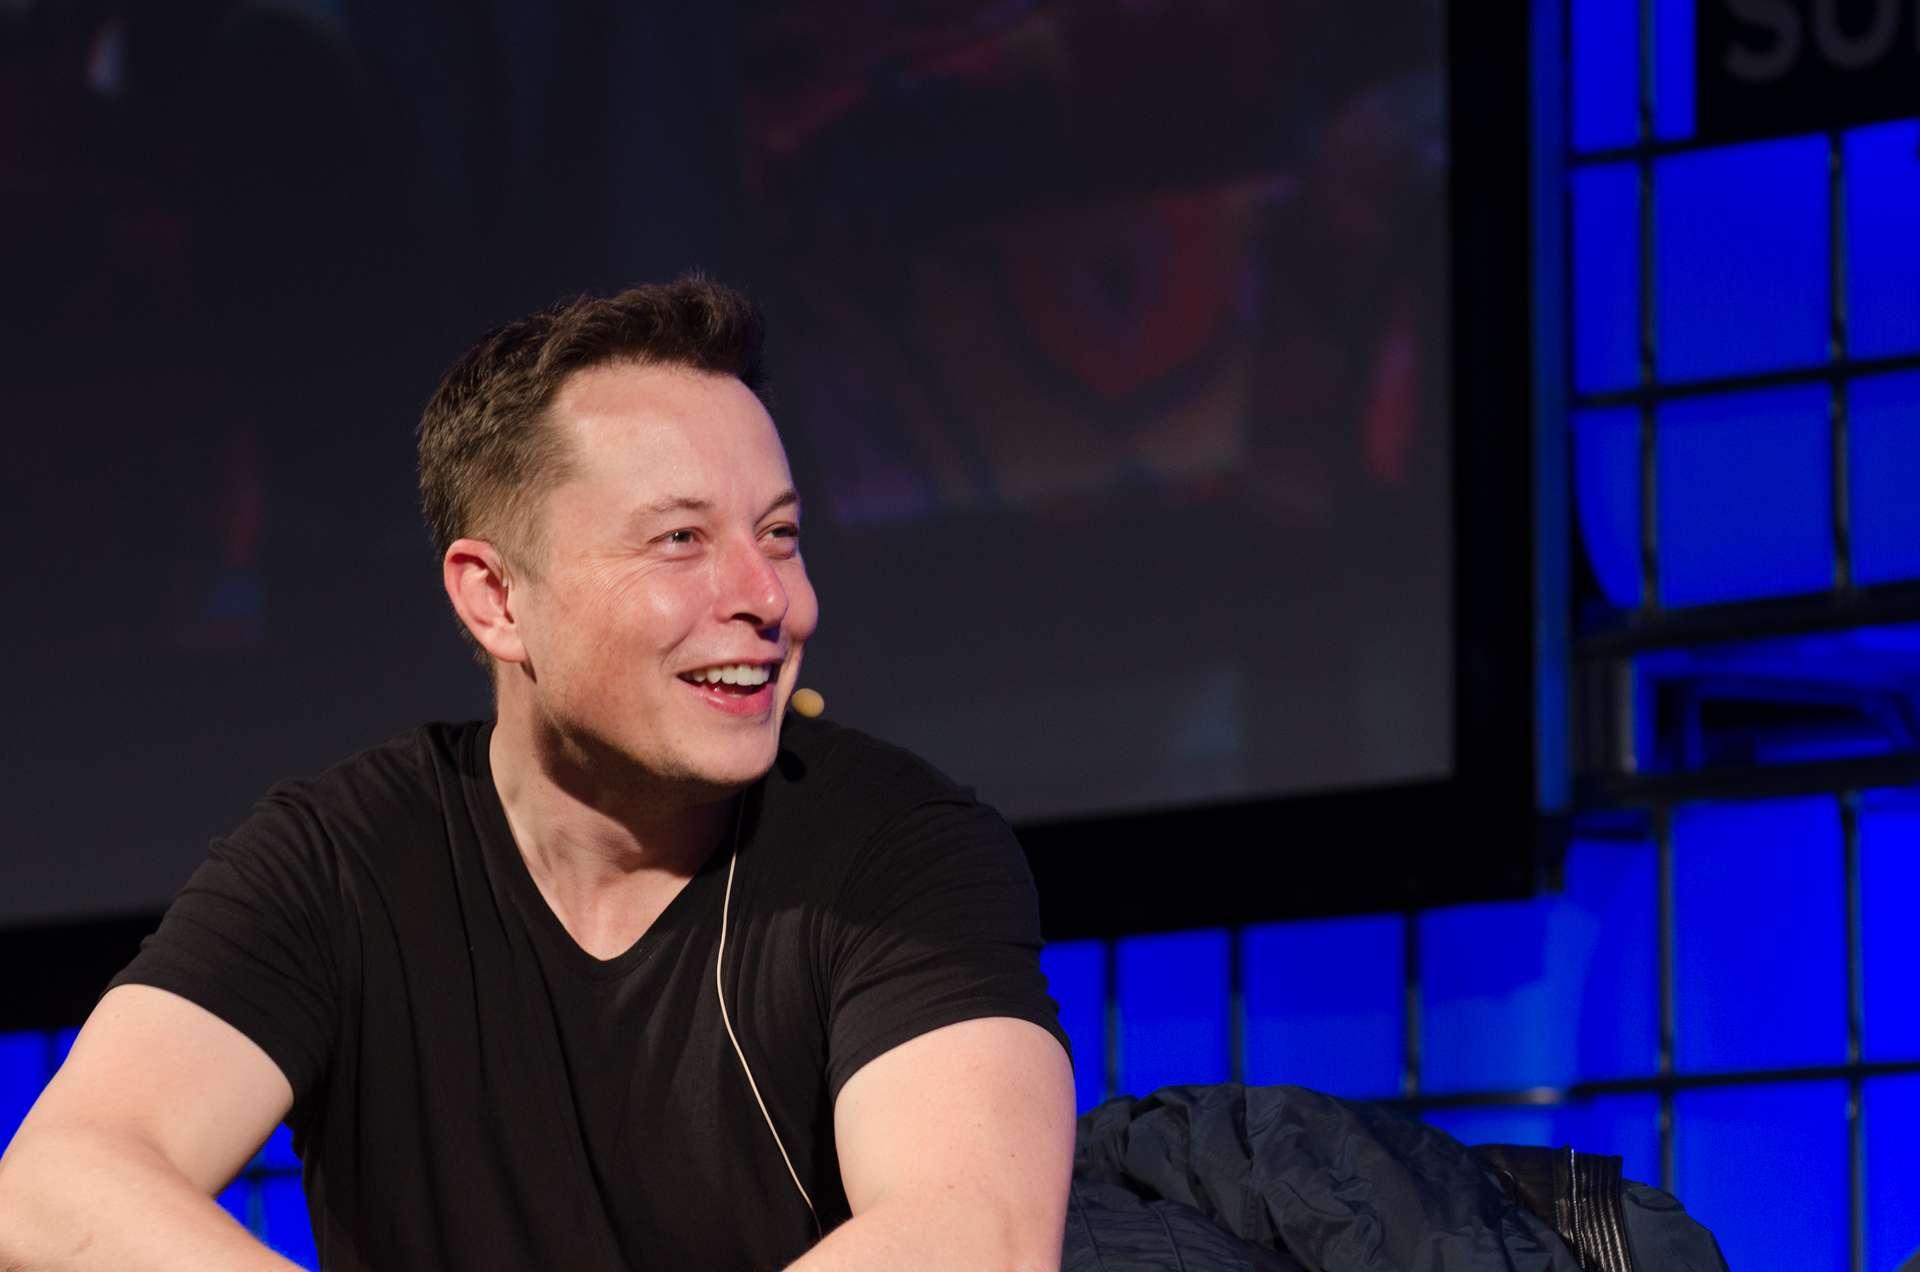 Tesla founder Elon Musk on stage at a forum on the internet in Dublin, Ireland in 2013. (Image Credit: Dan Taylor/Heisenberg Media)